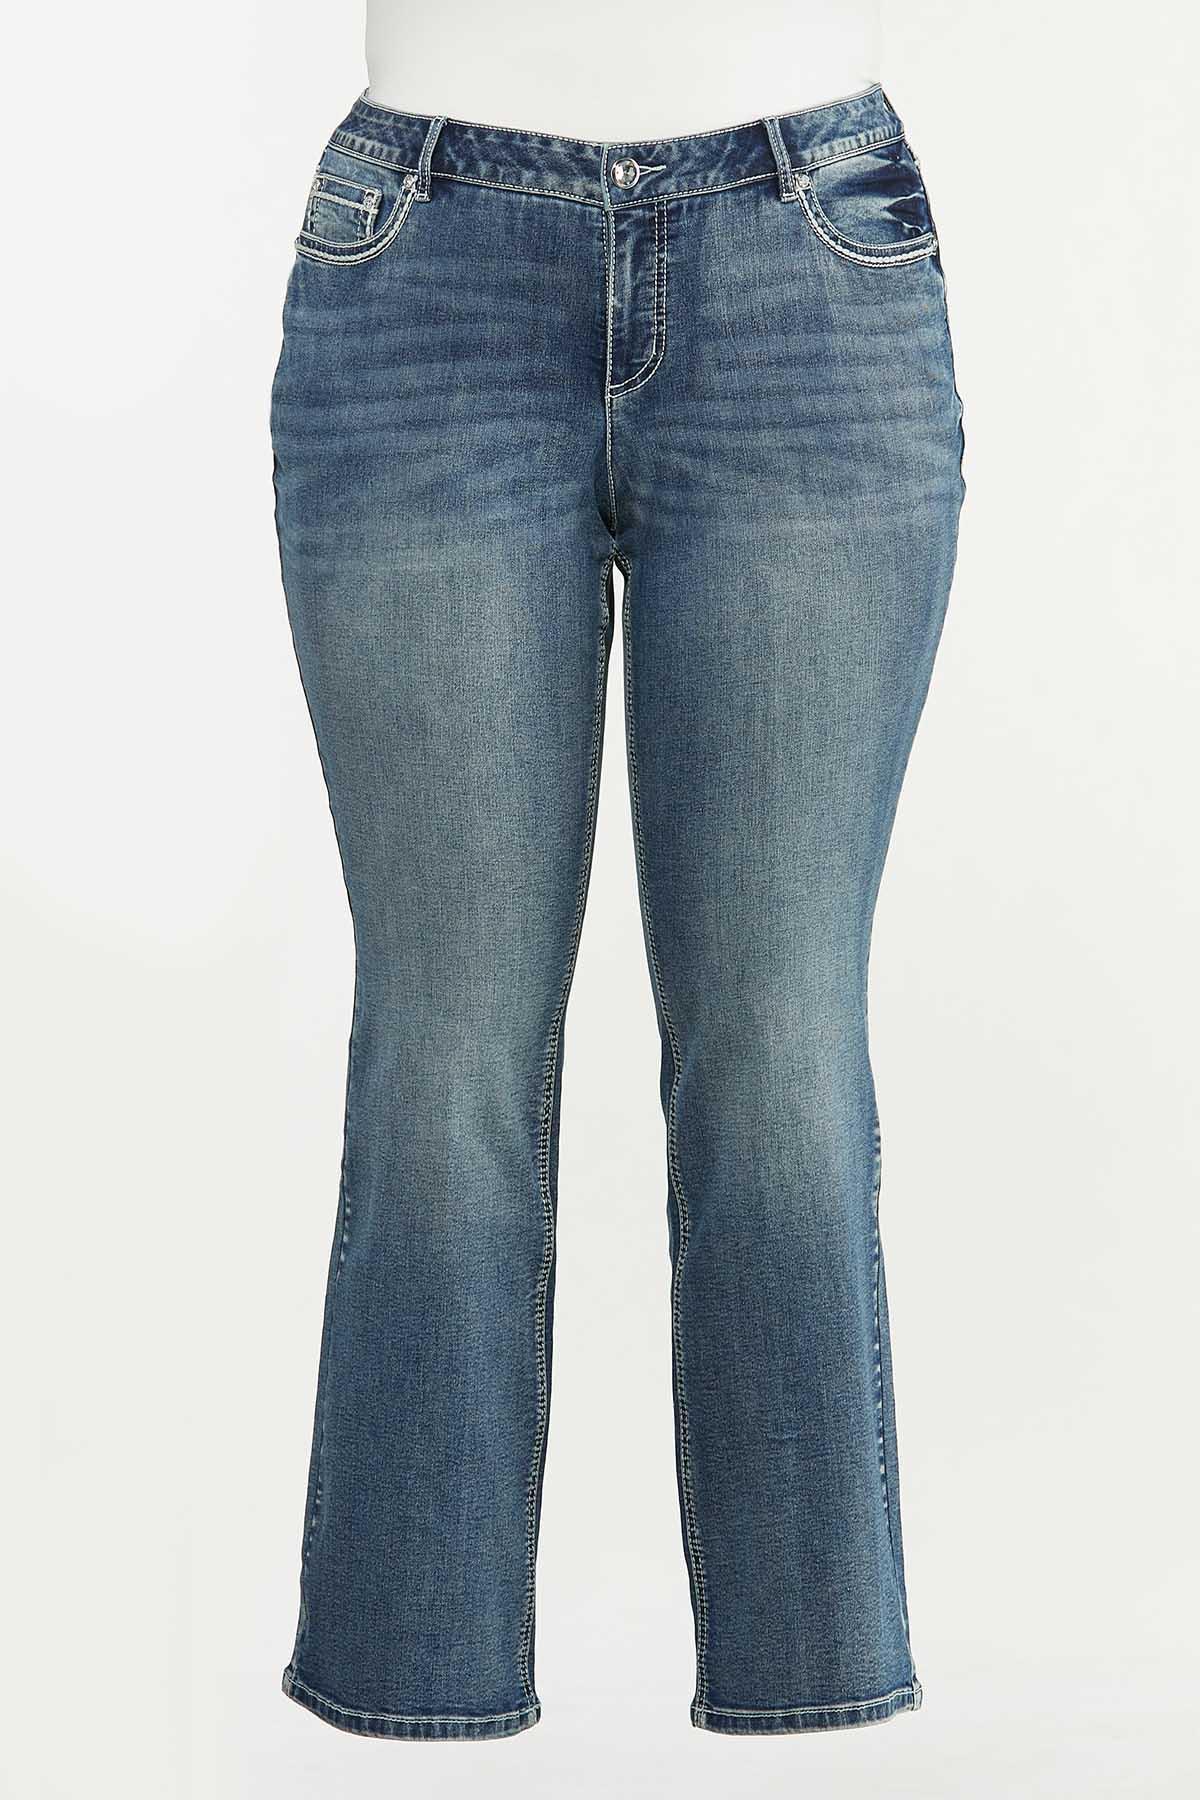 Plus Petite Star Studded Bootcut Jeans (Item #44674516)